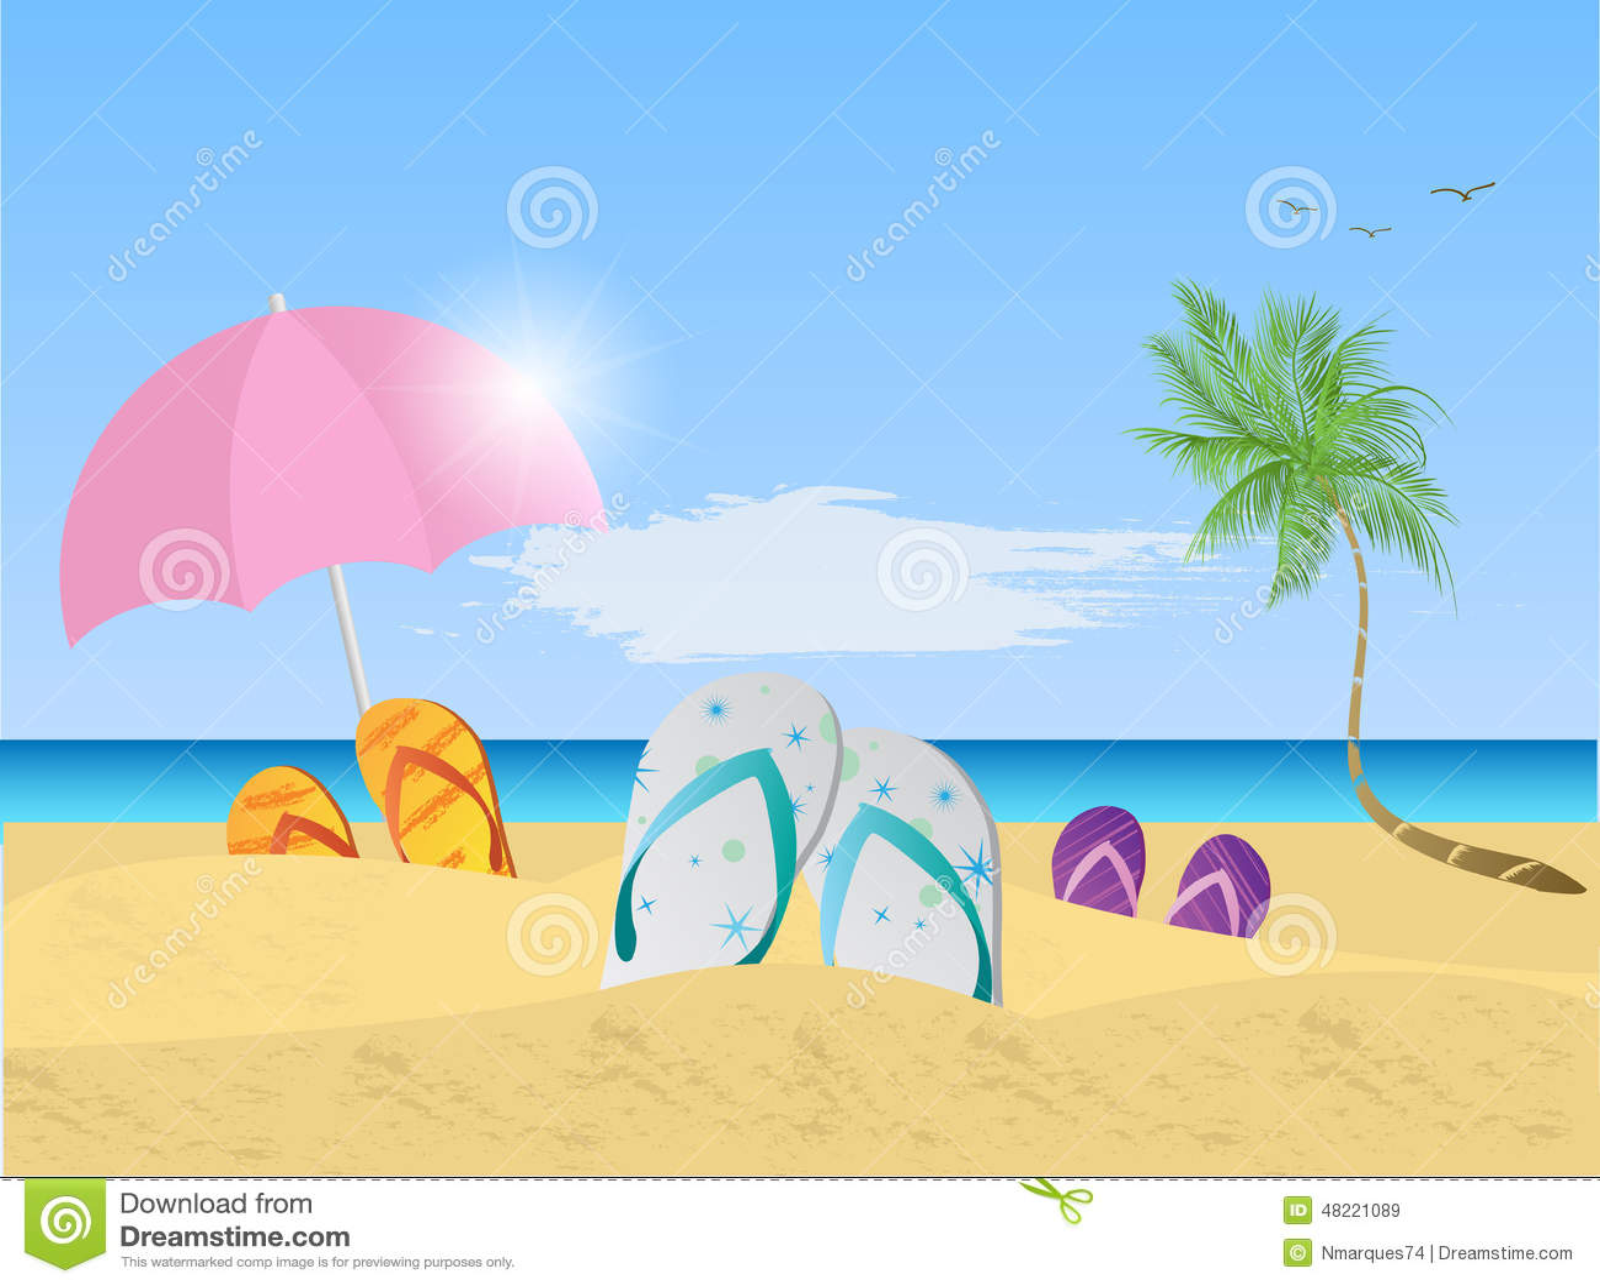 Beach Scene Illustration stock vector. Image of sandals ...